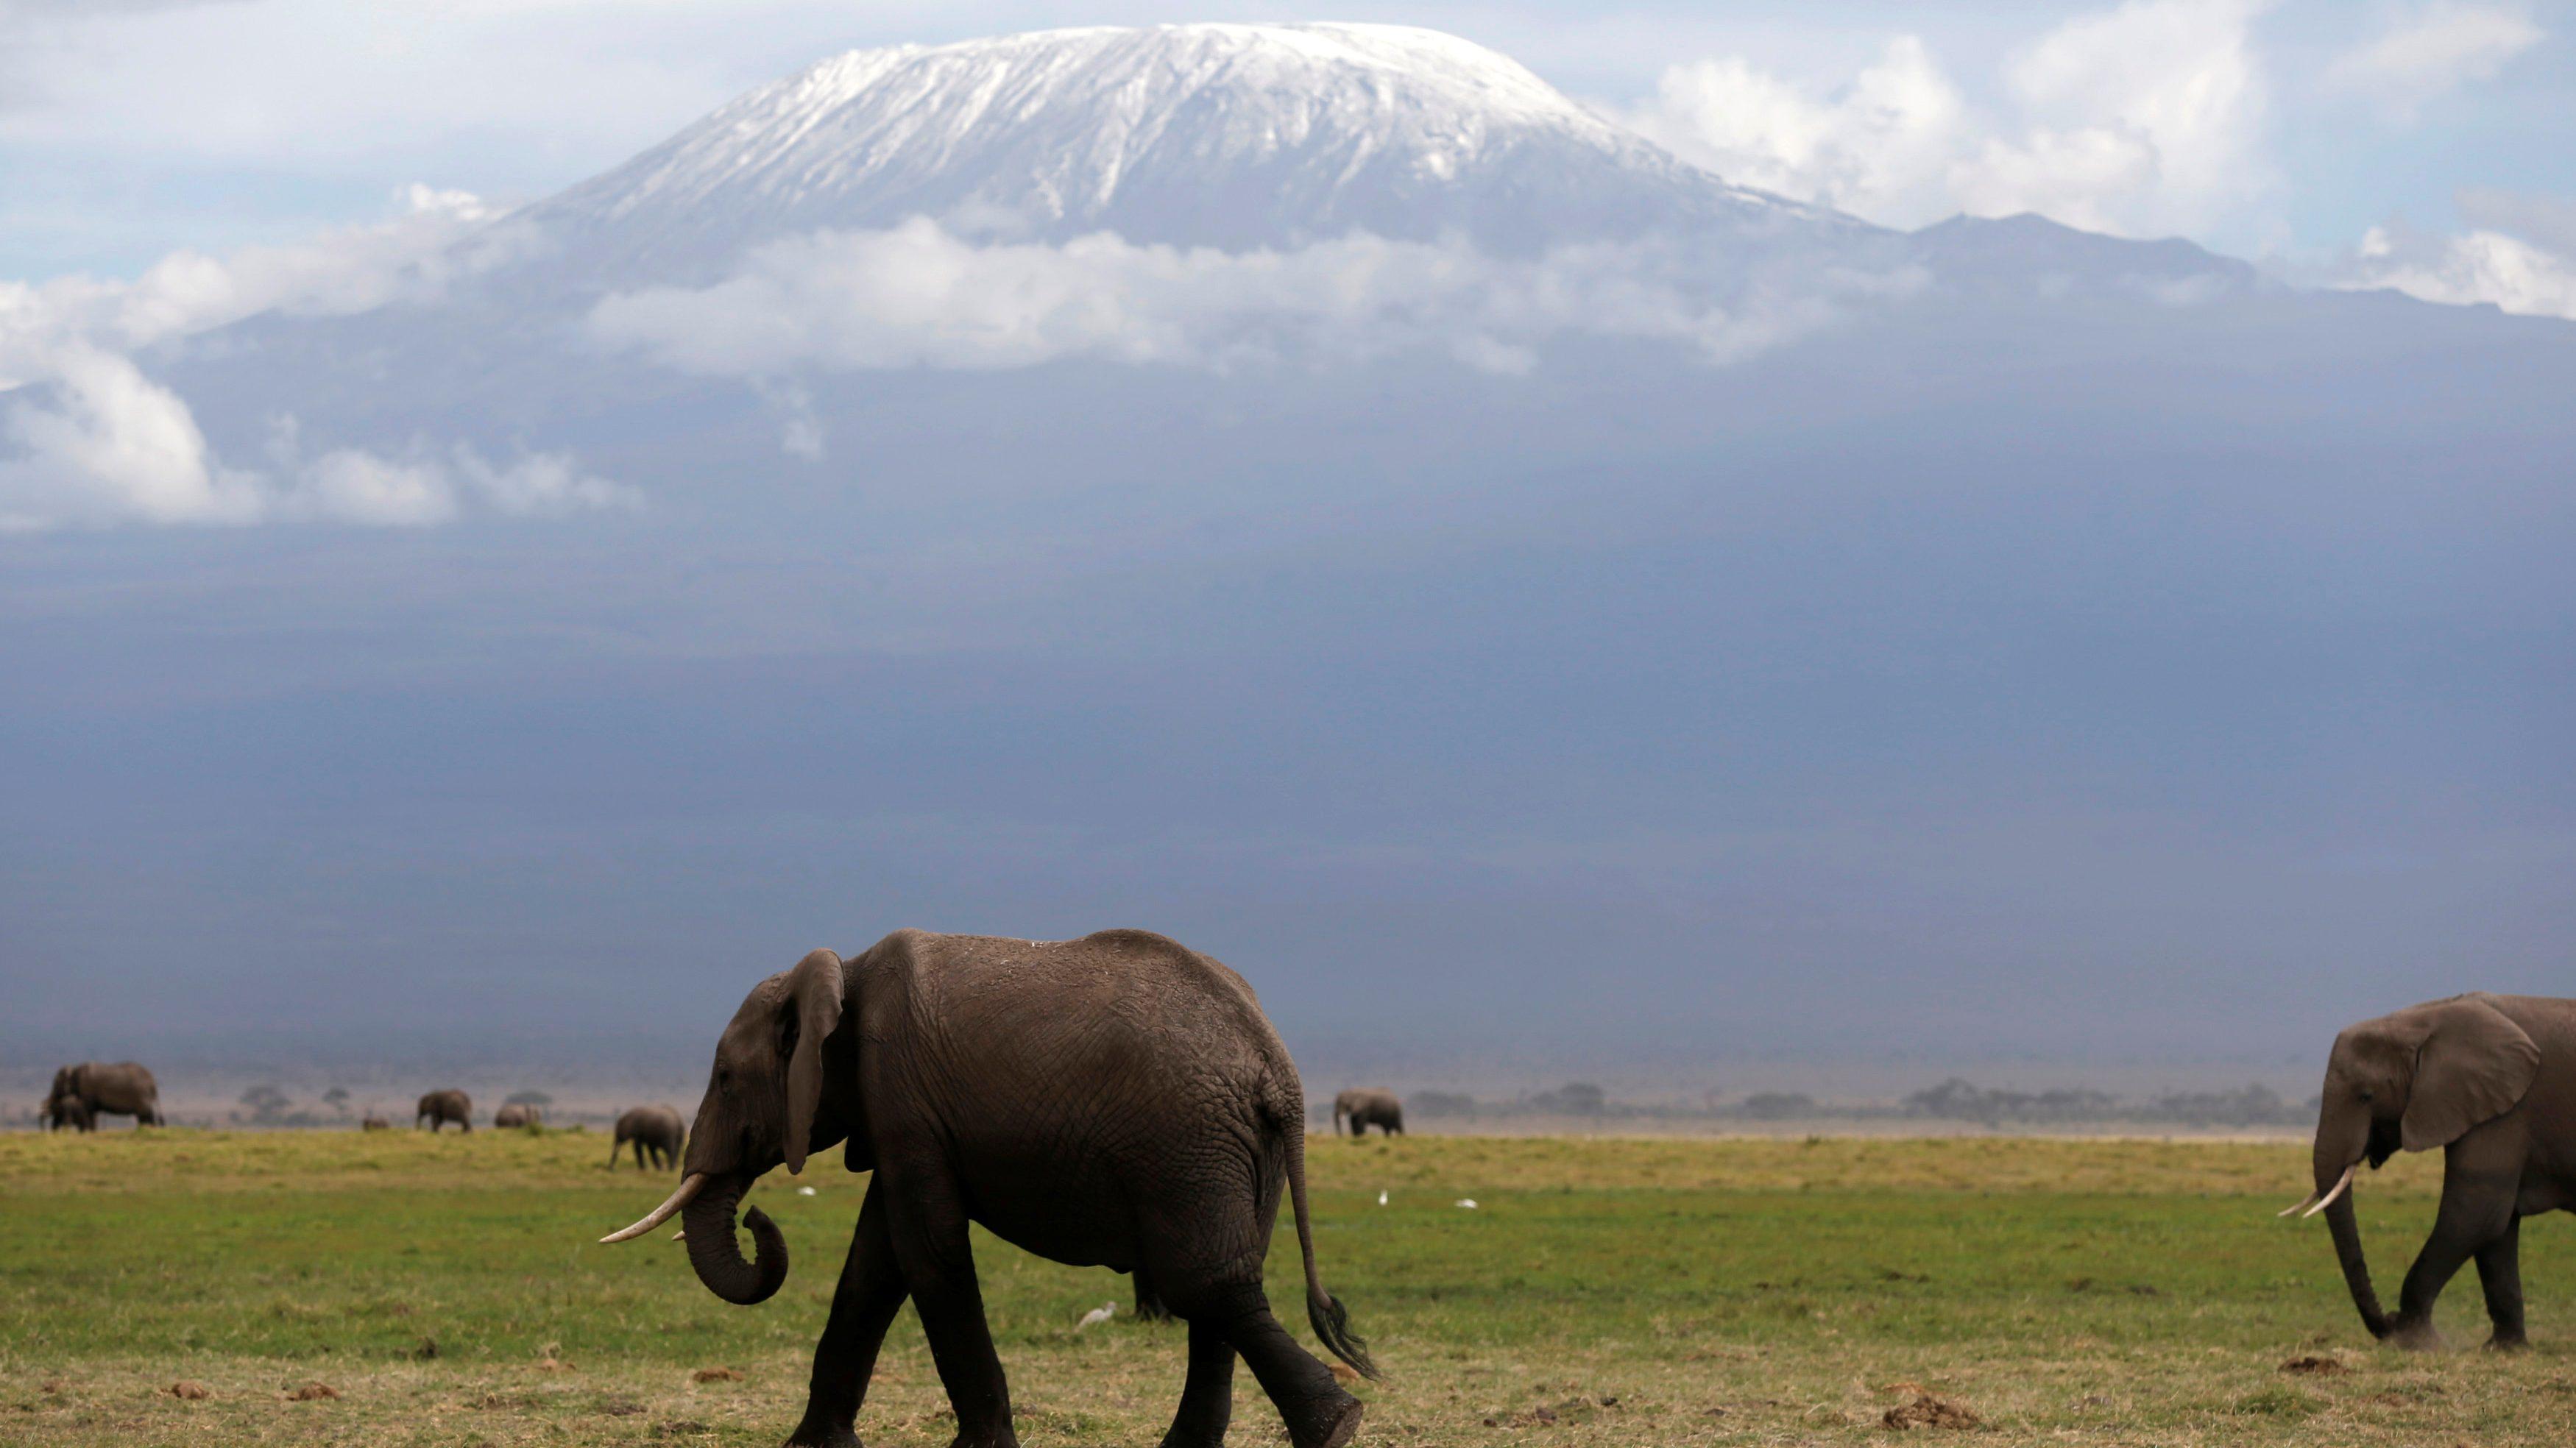 Elephants walk in Amboseli National Park in front of Kilimanjaro mountain